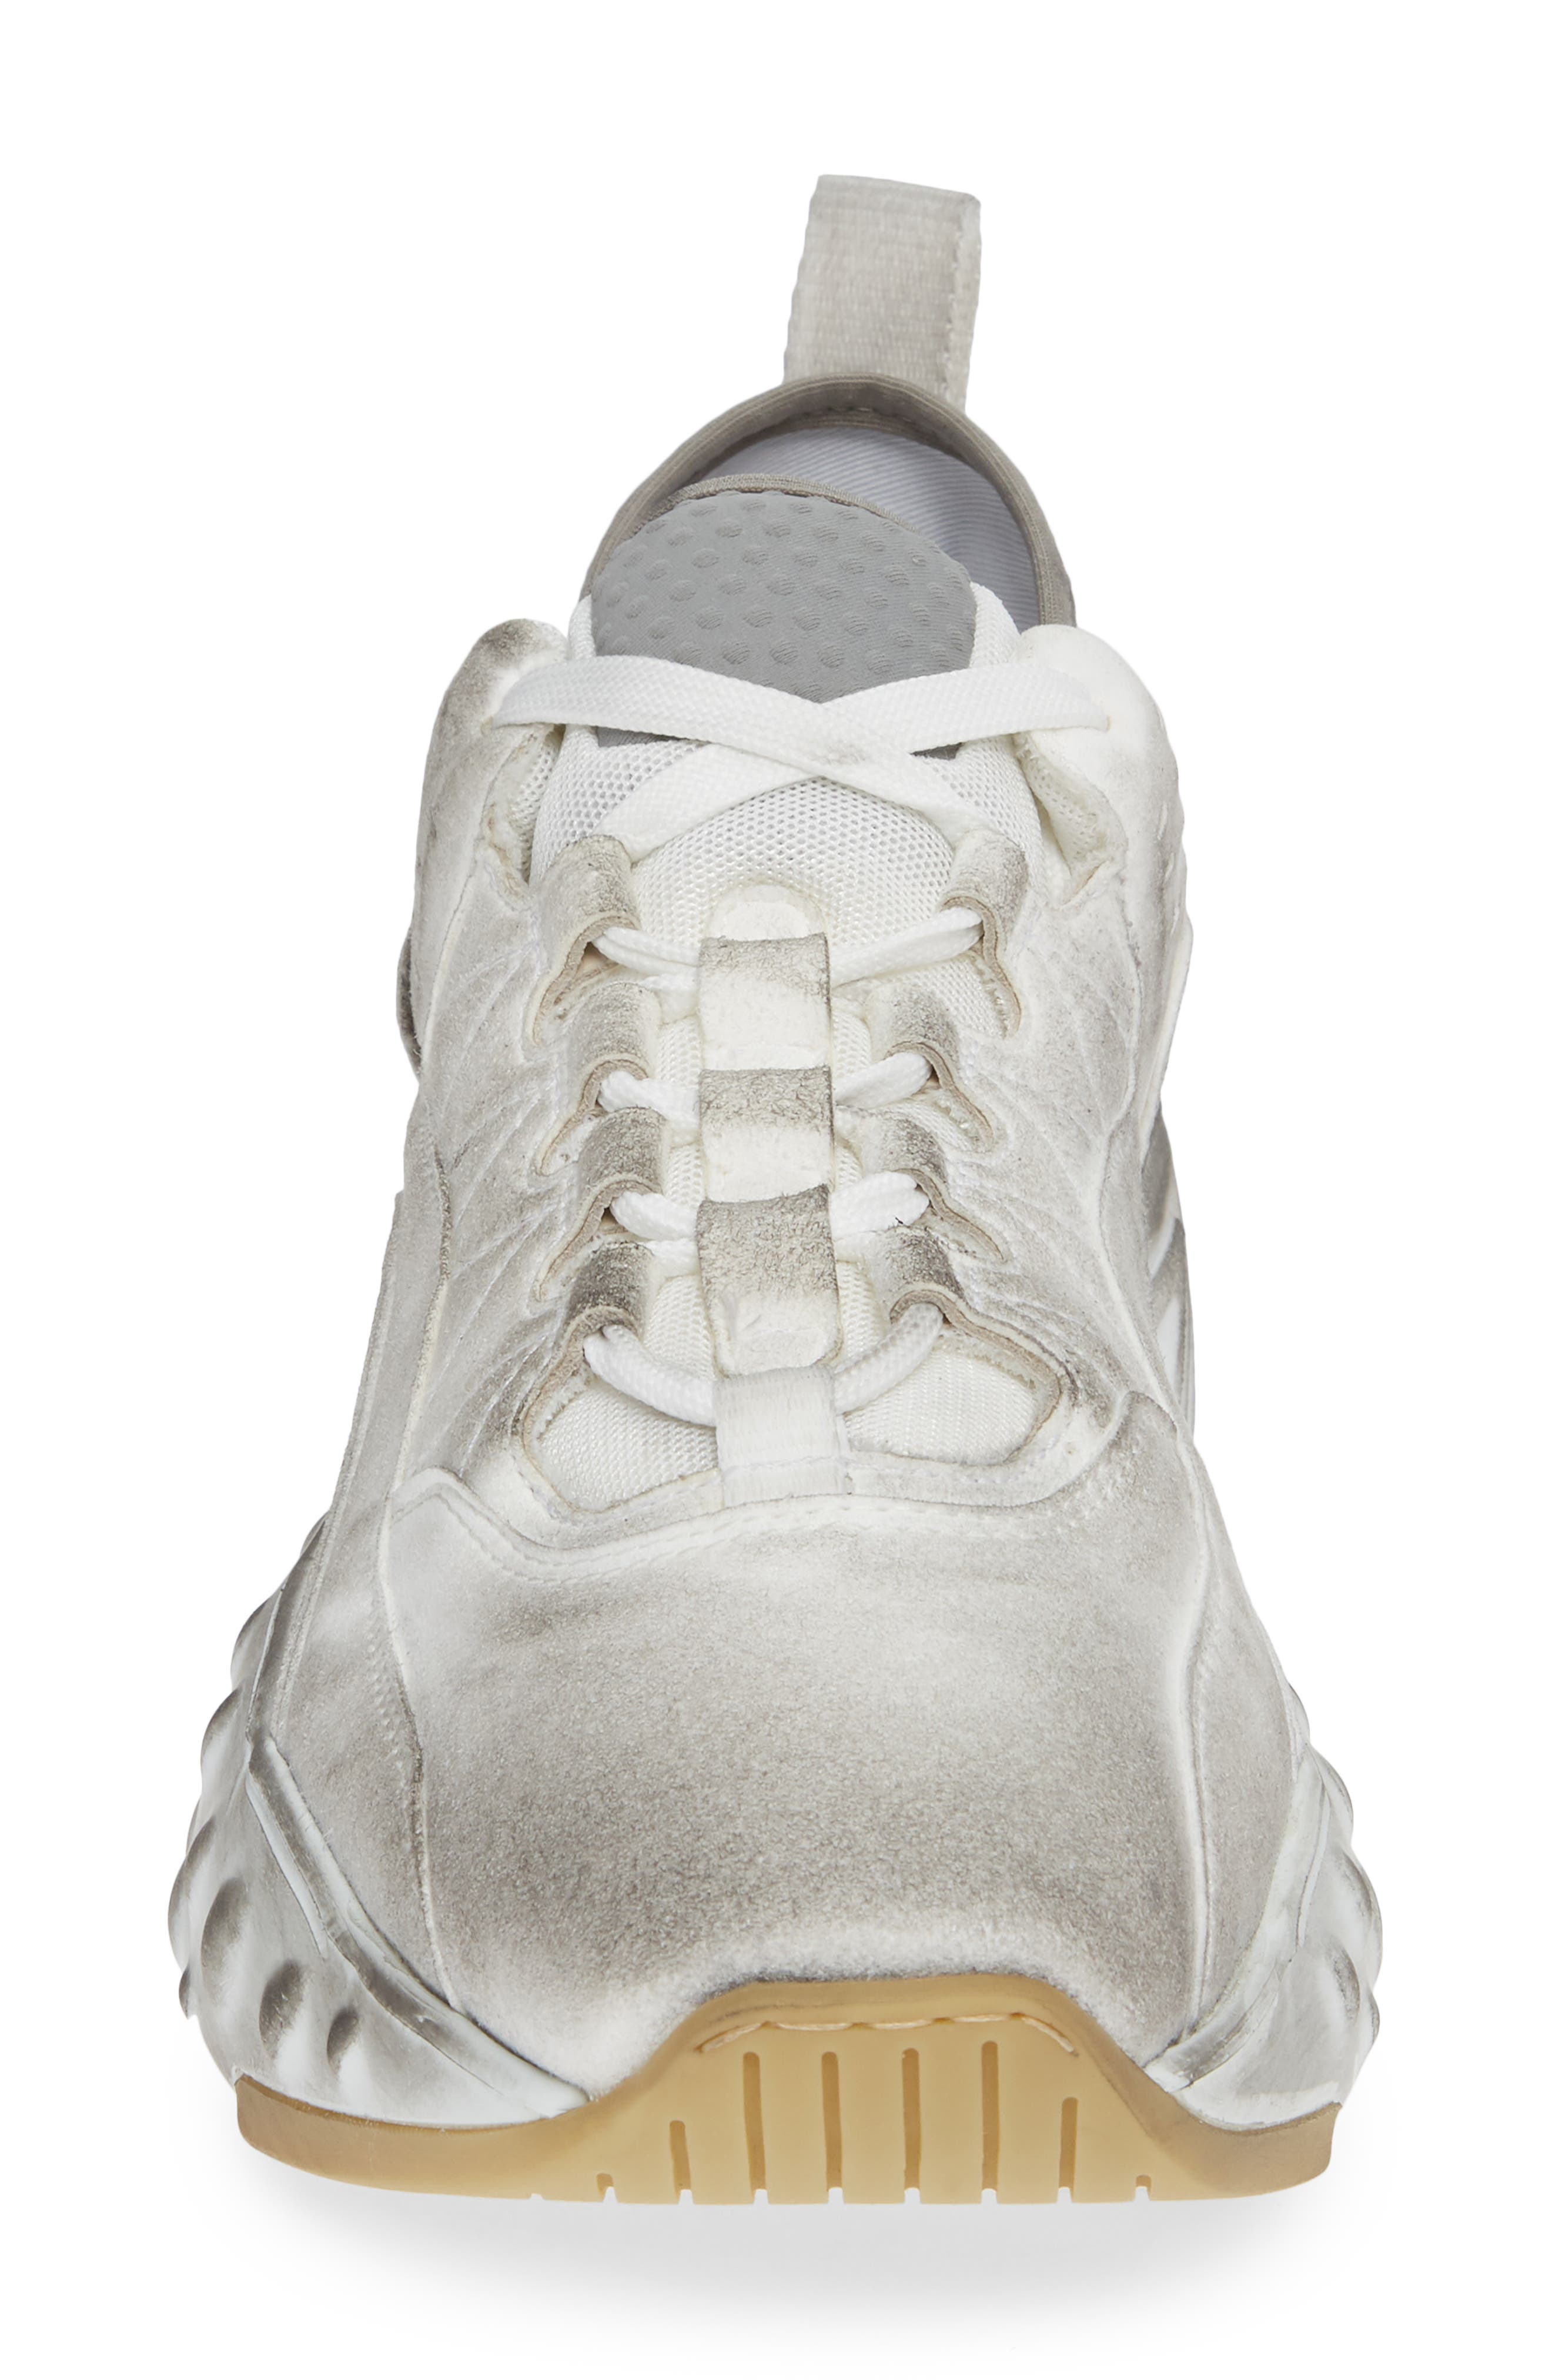 Rockaway Built-Up Sneaker,                             Alternate thumbnail 4, color,                             WHITE